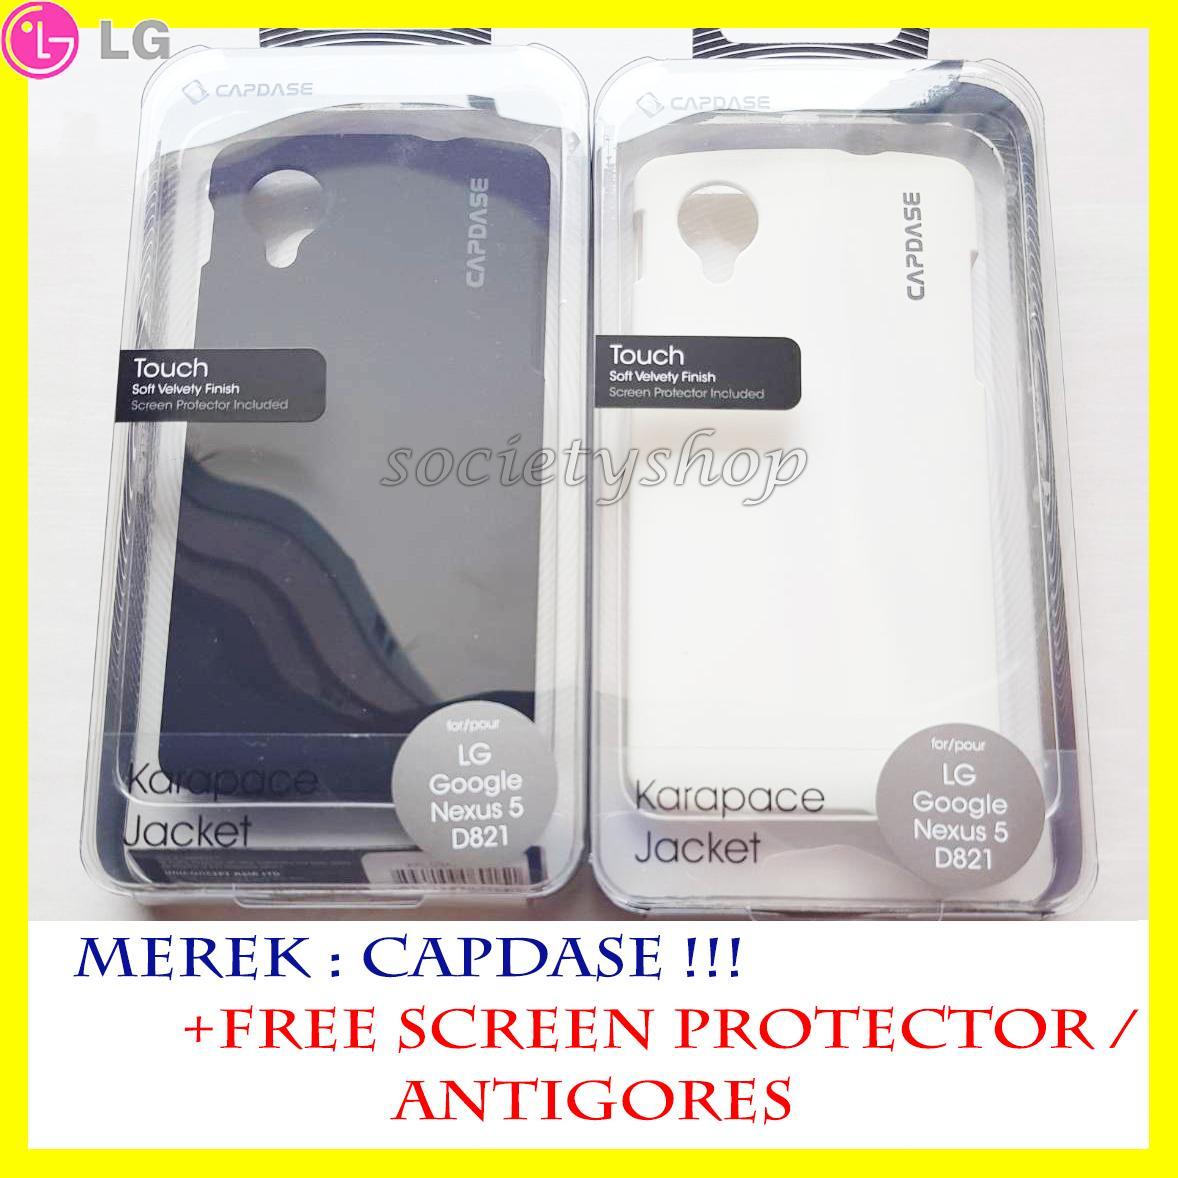 Hp Pixel Terbaik Termurah Style Hijab Muslimah Cashing  Casing Lg Nexus 5 Google D821 Lama Cover Case Black Putih Hitam Full Baru Murah